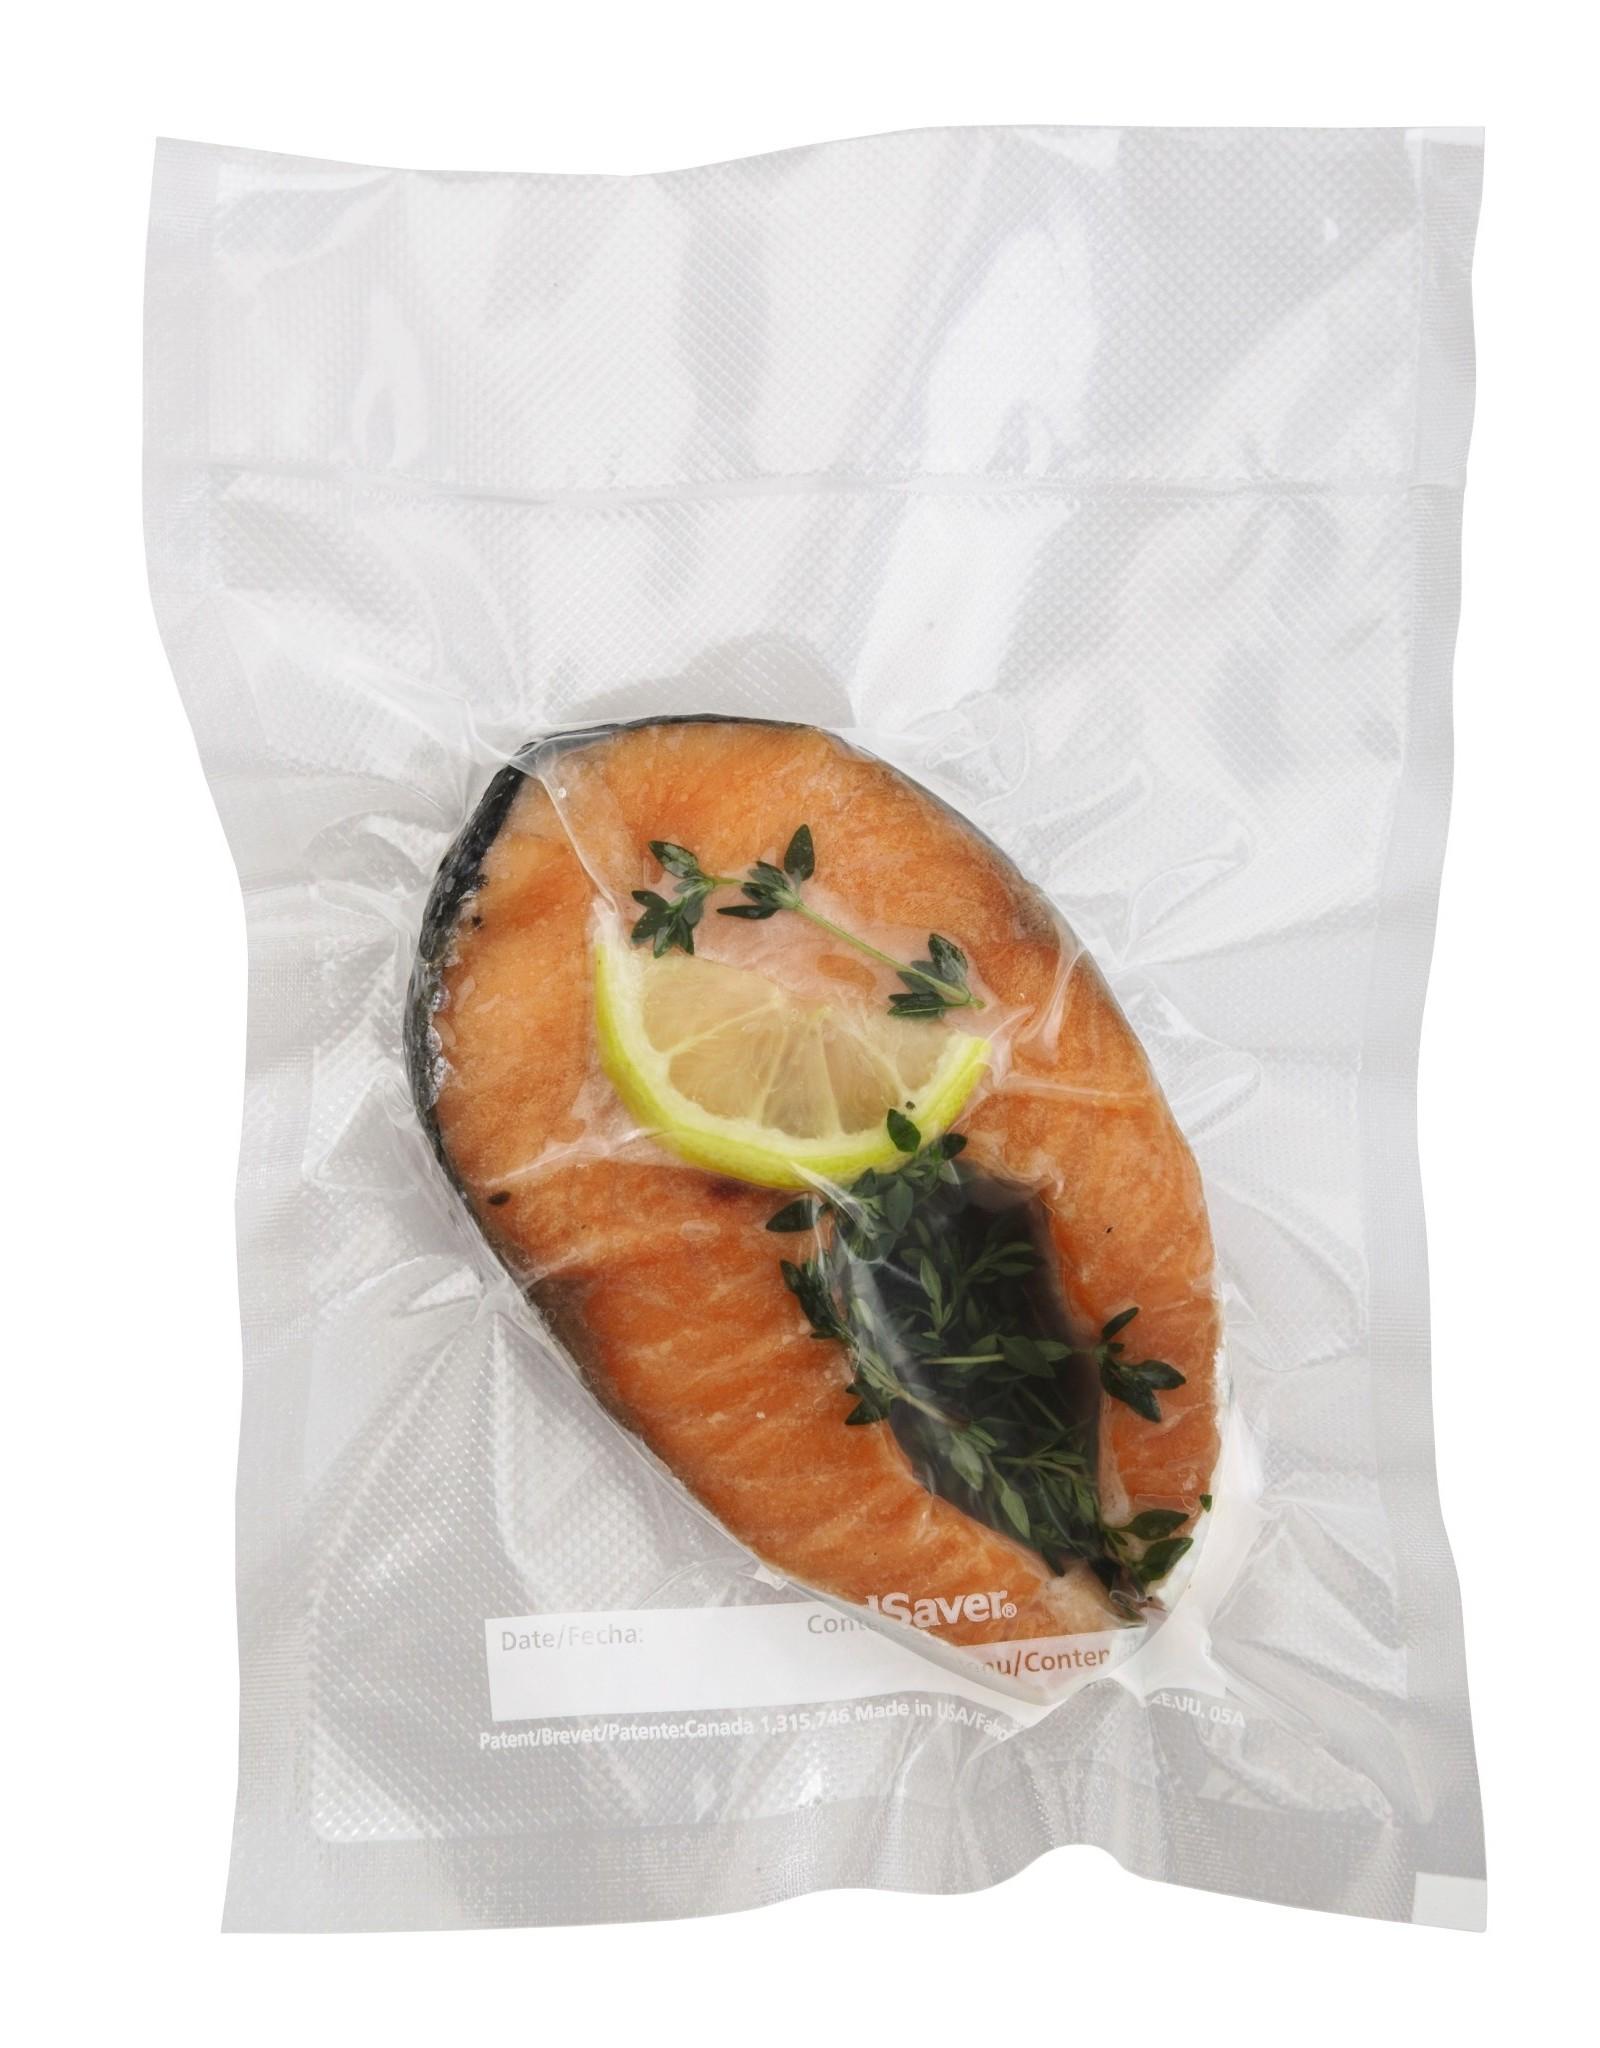 FOODSAVER FOODSAVER FSV015 PREMIUM ZILVER INCL. FRESH ADAPTER